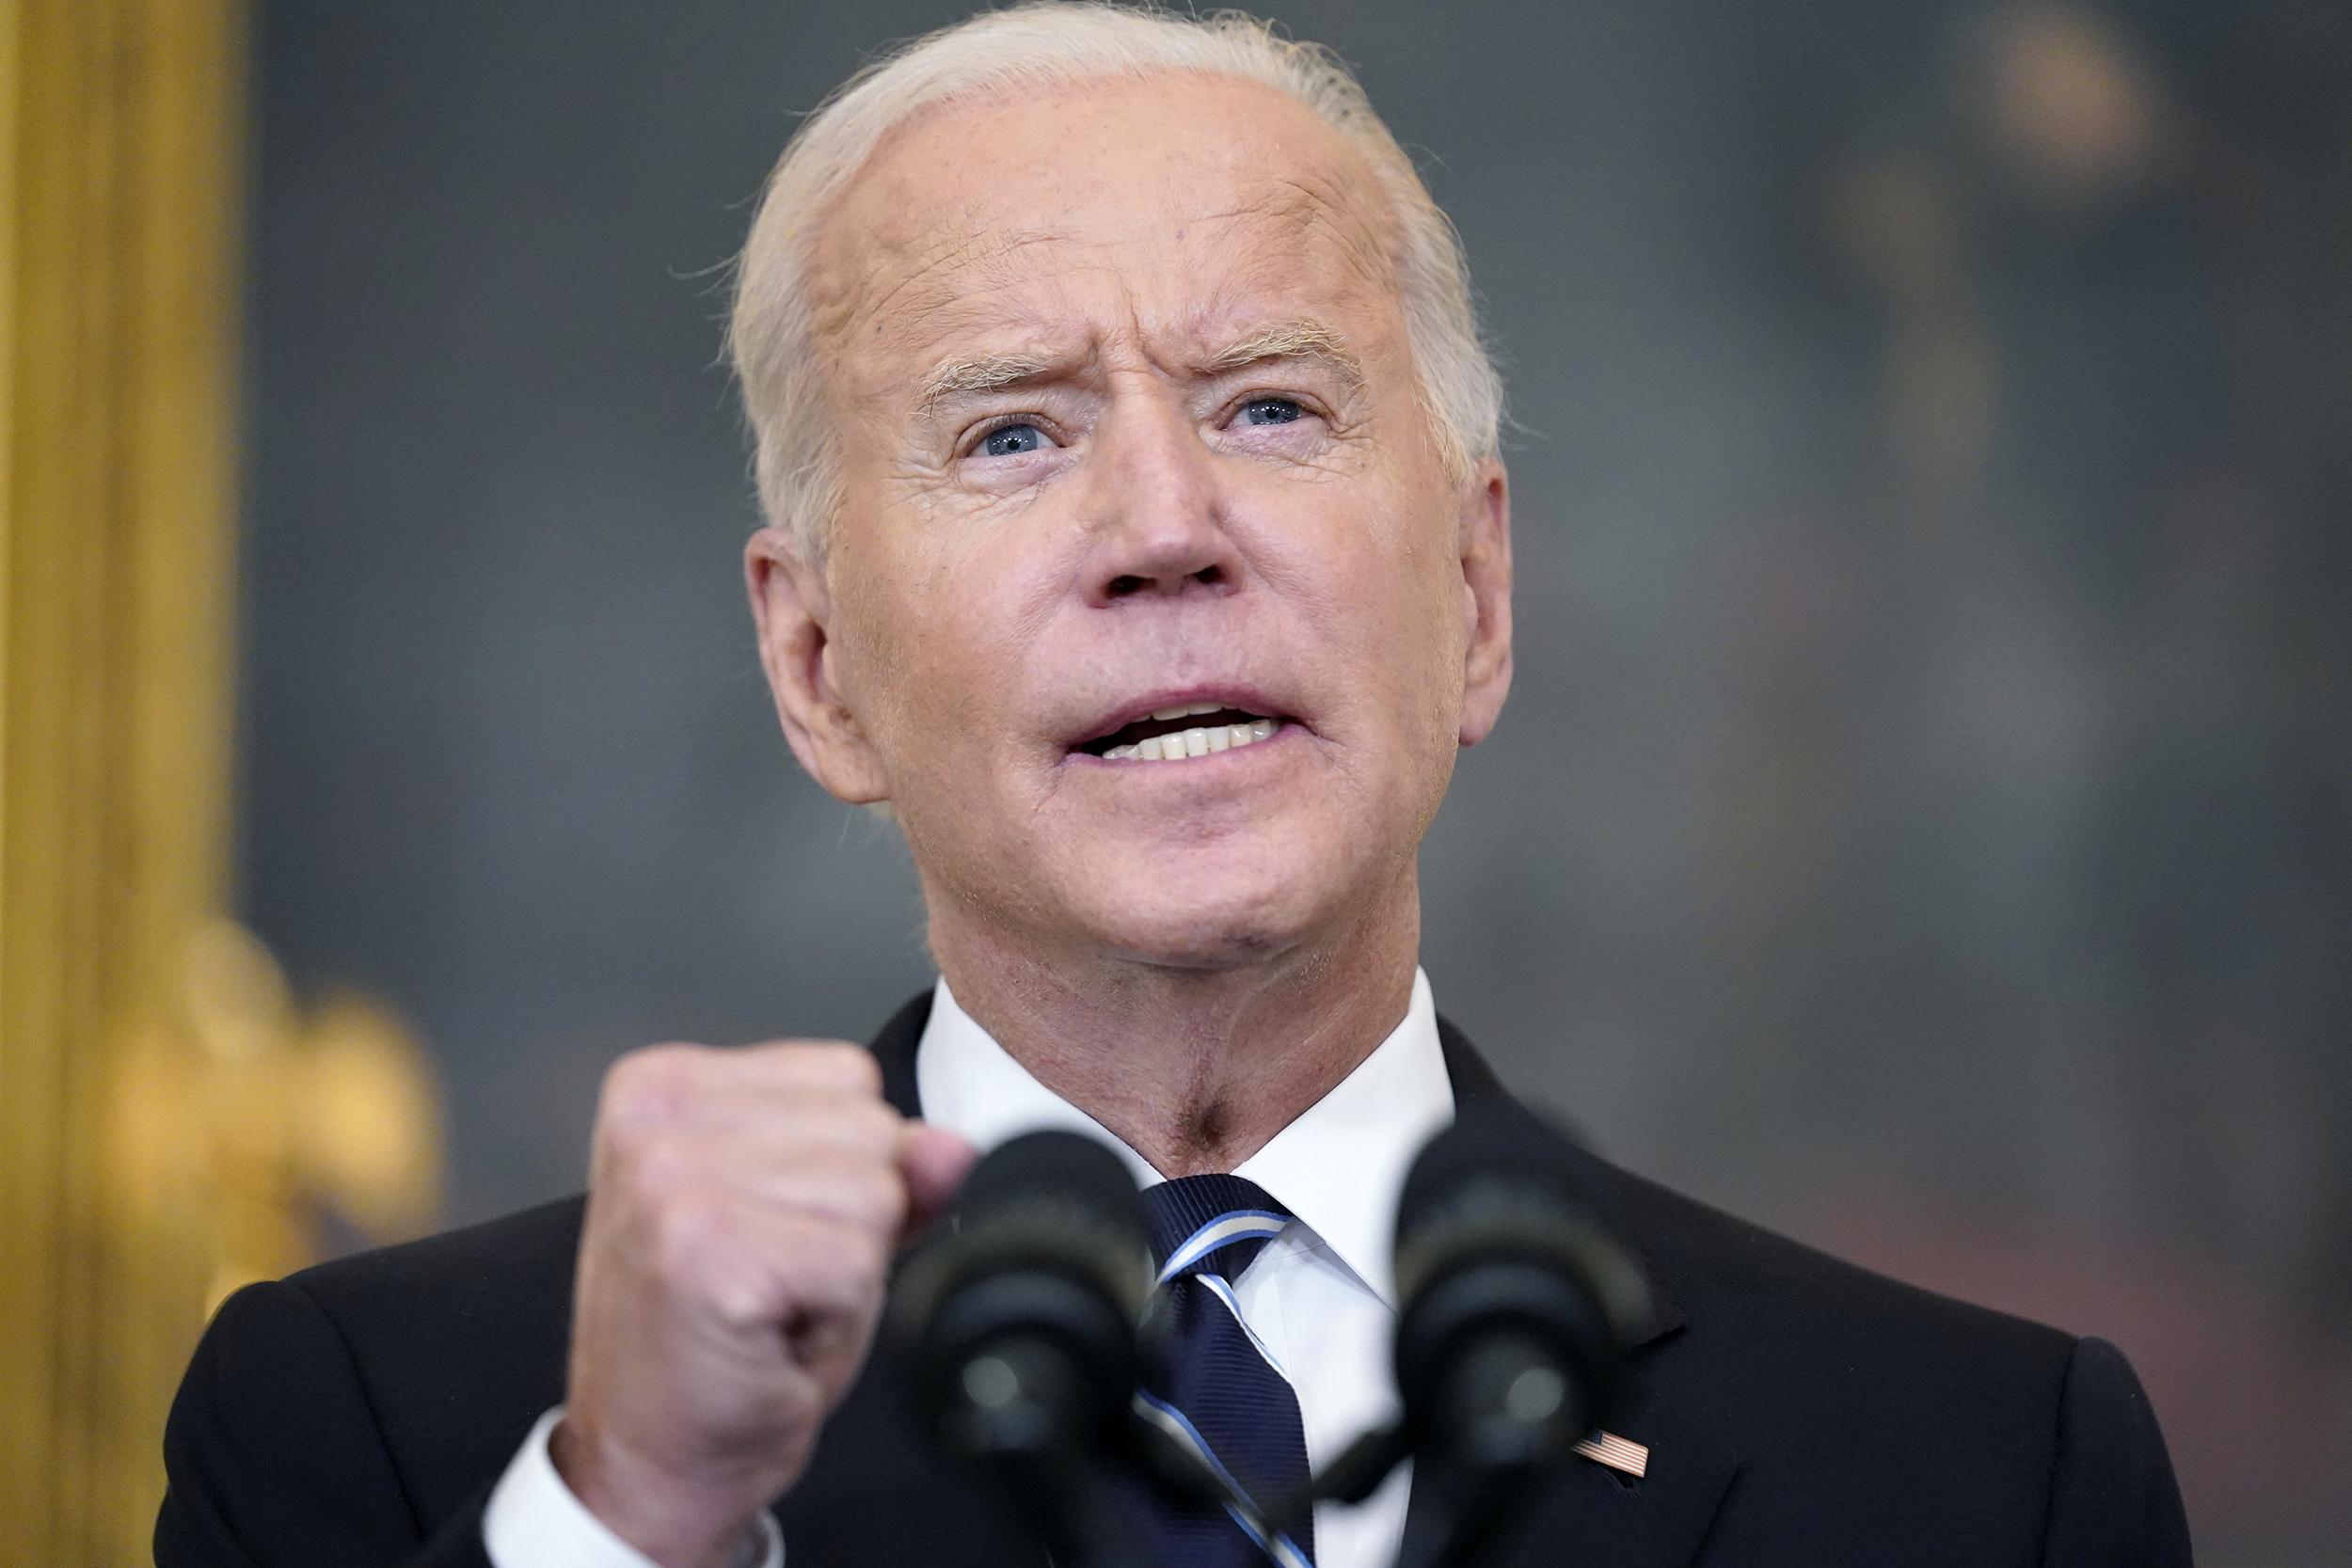 Is Biden's vaccine mandate 'unconstitutional'? Eye roll